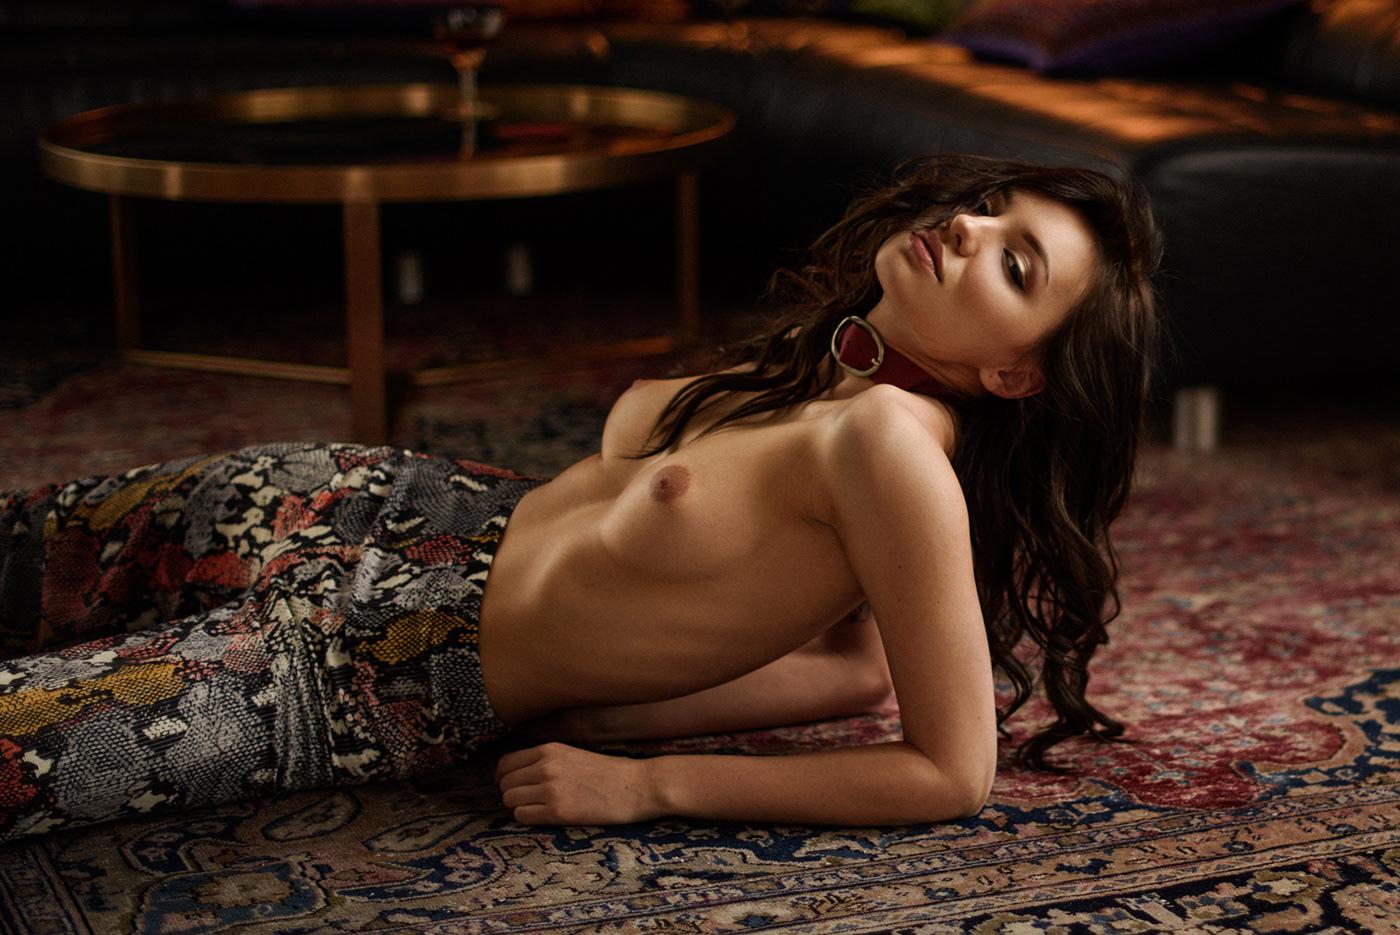 Let's get it on / фотограф Sacha Leyendecker модель Ana Tomou